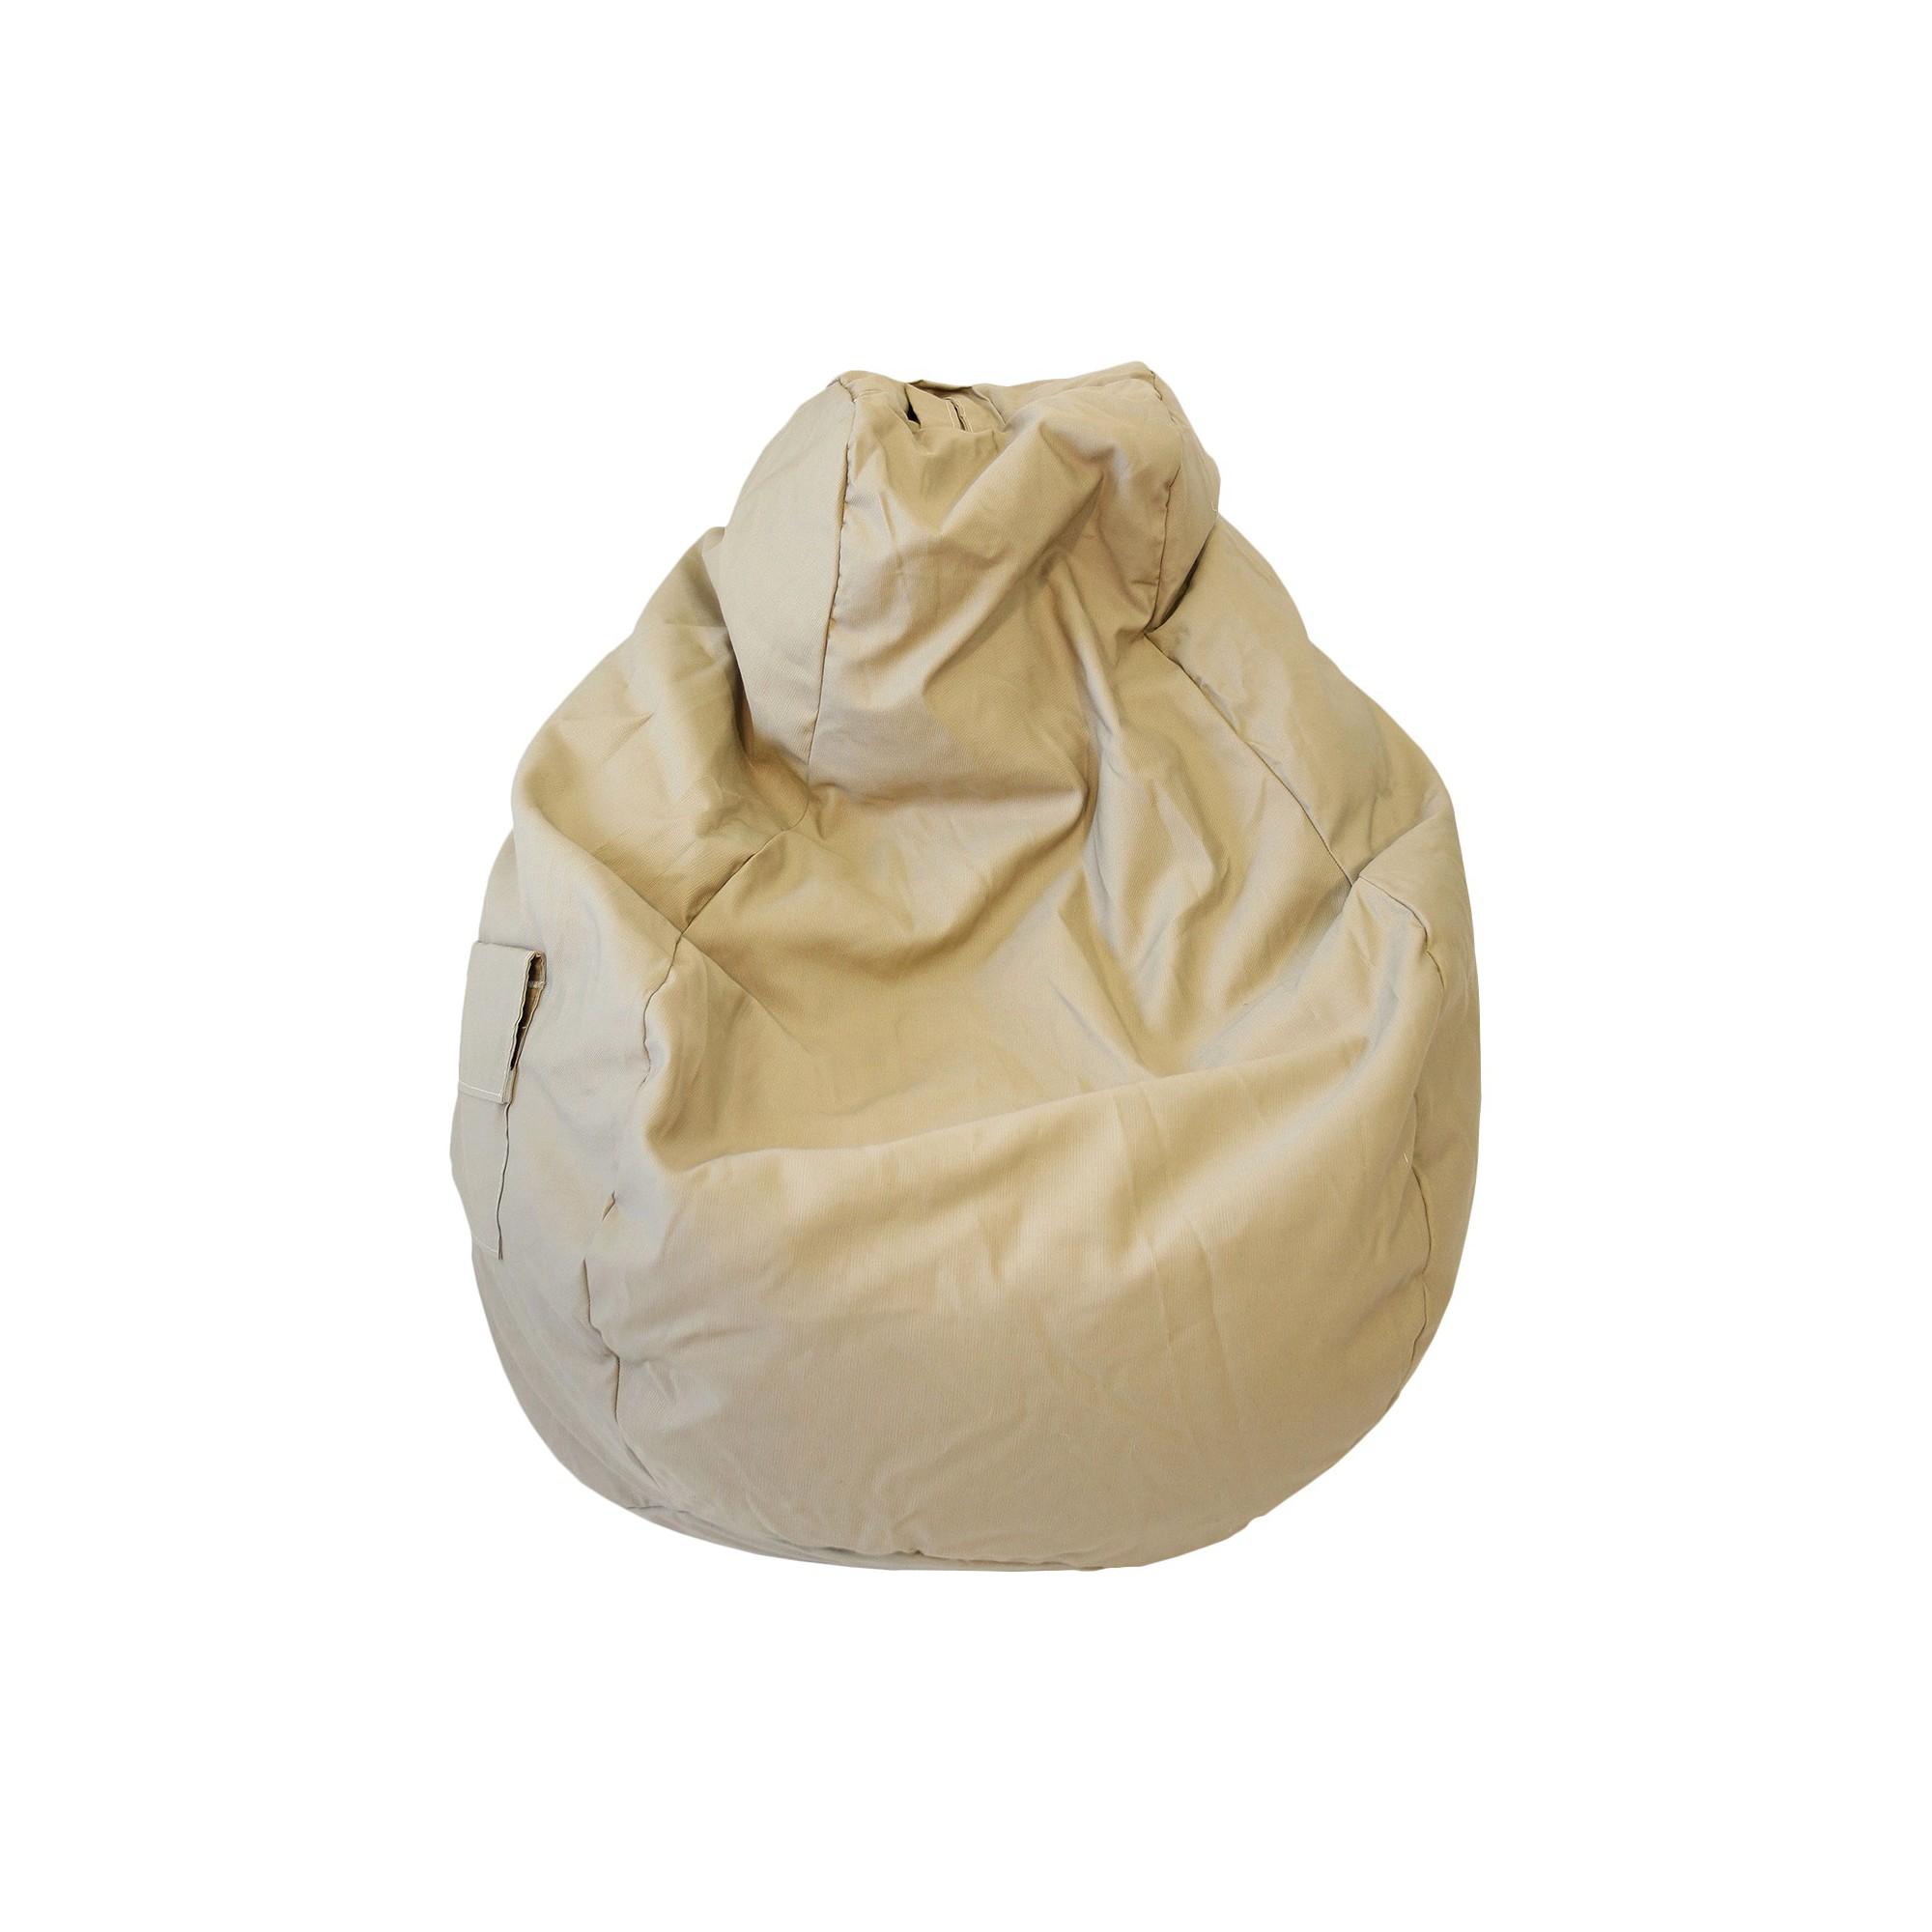 Gold Medal Cotton Large Tear Drop Demin Look Bean Bag with Pocket - Khaki, True Khaki